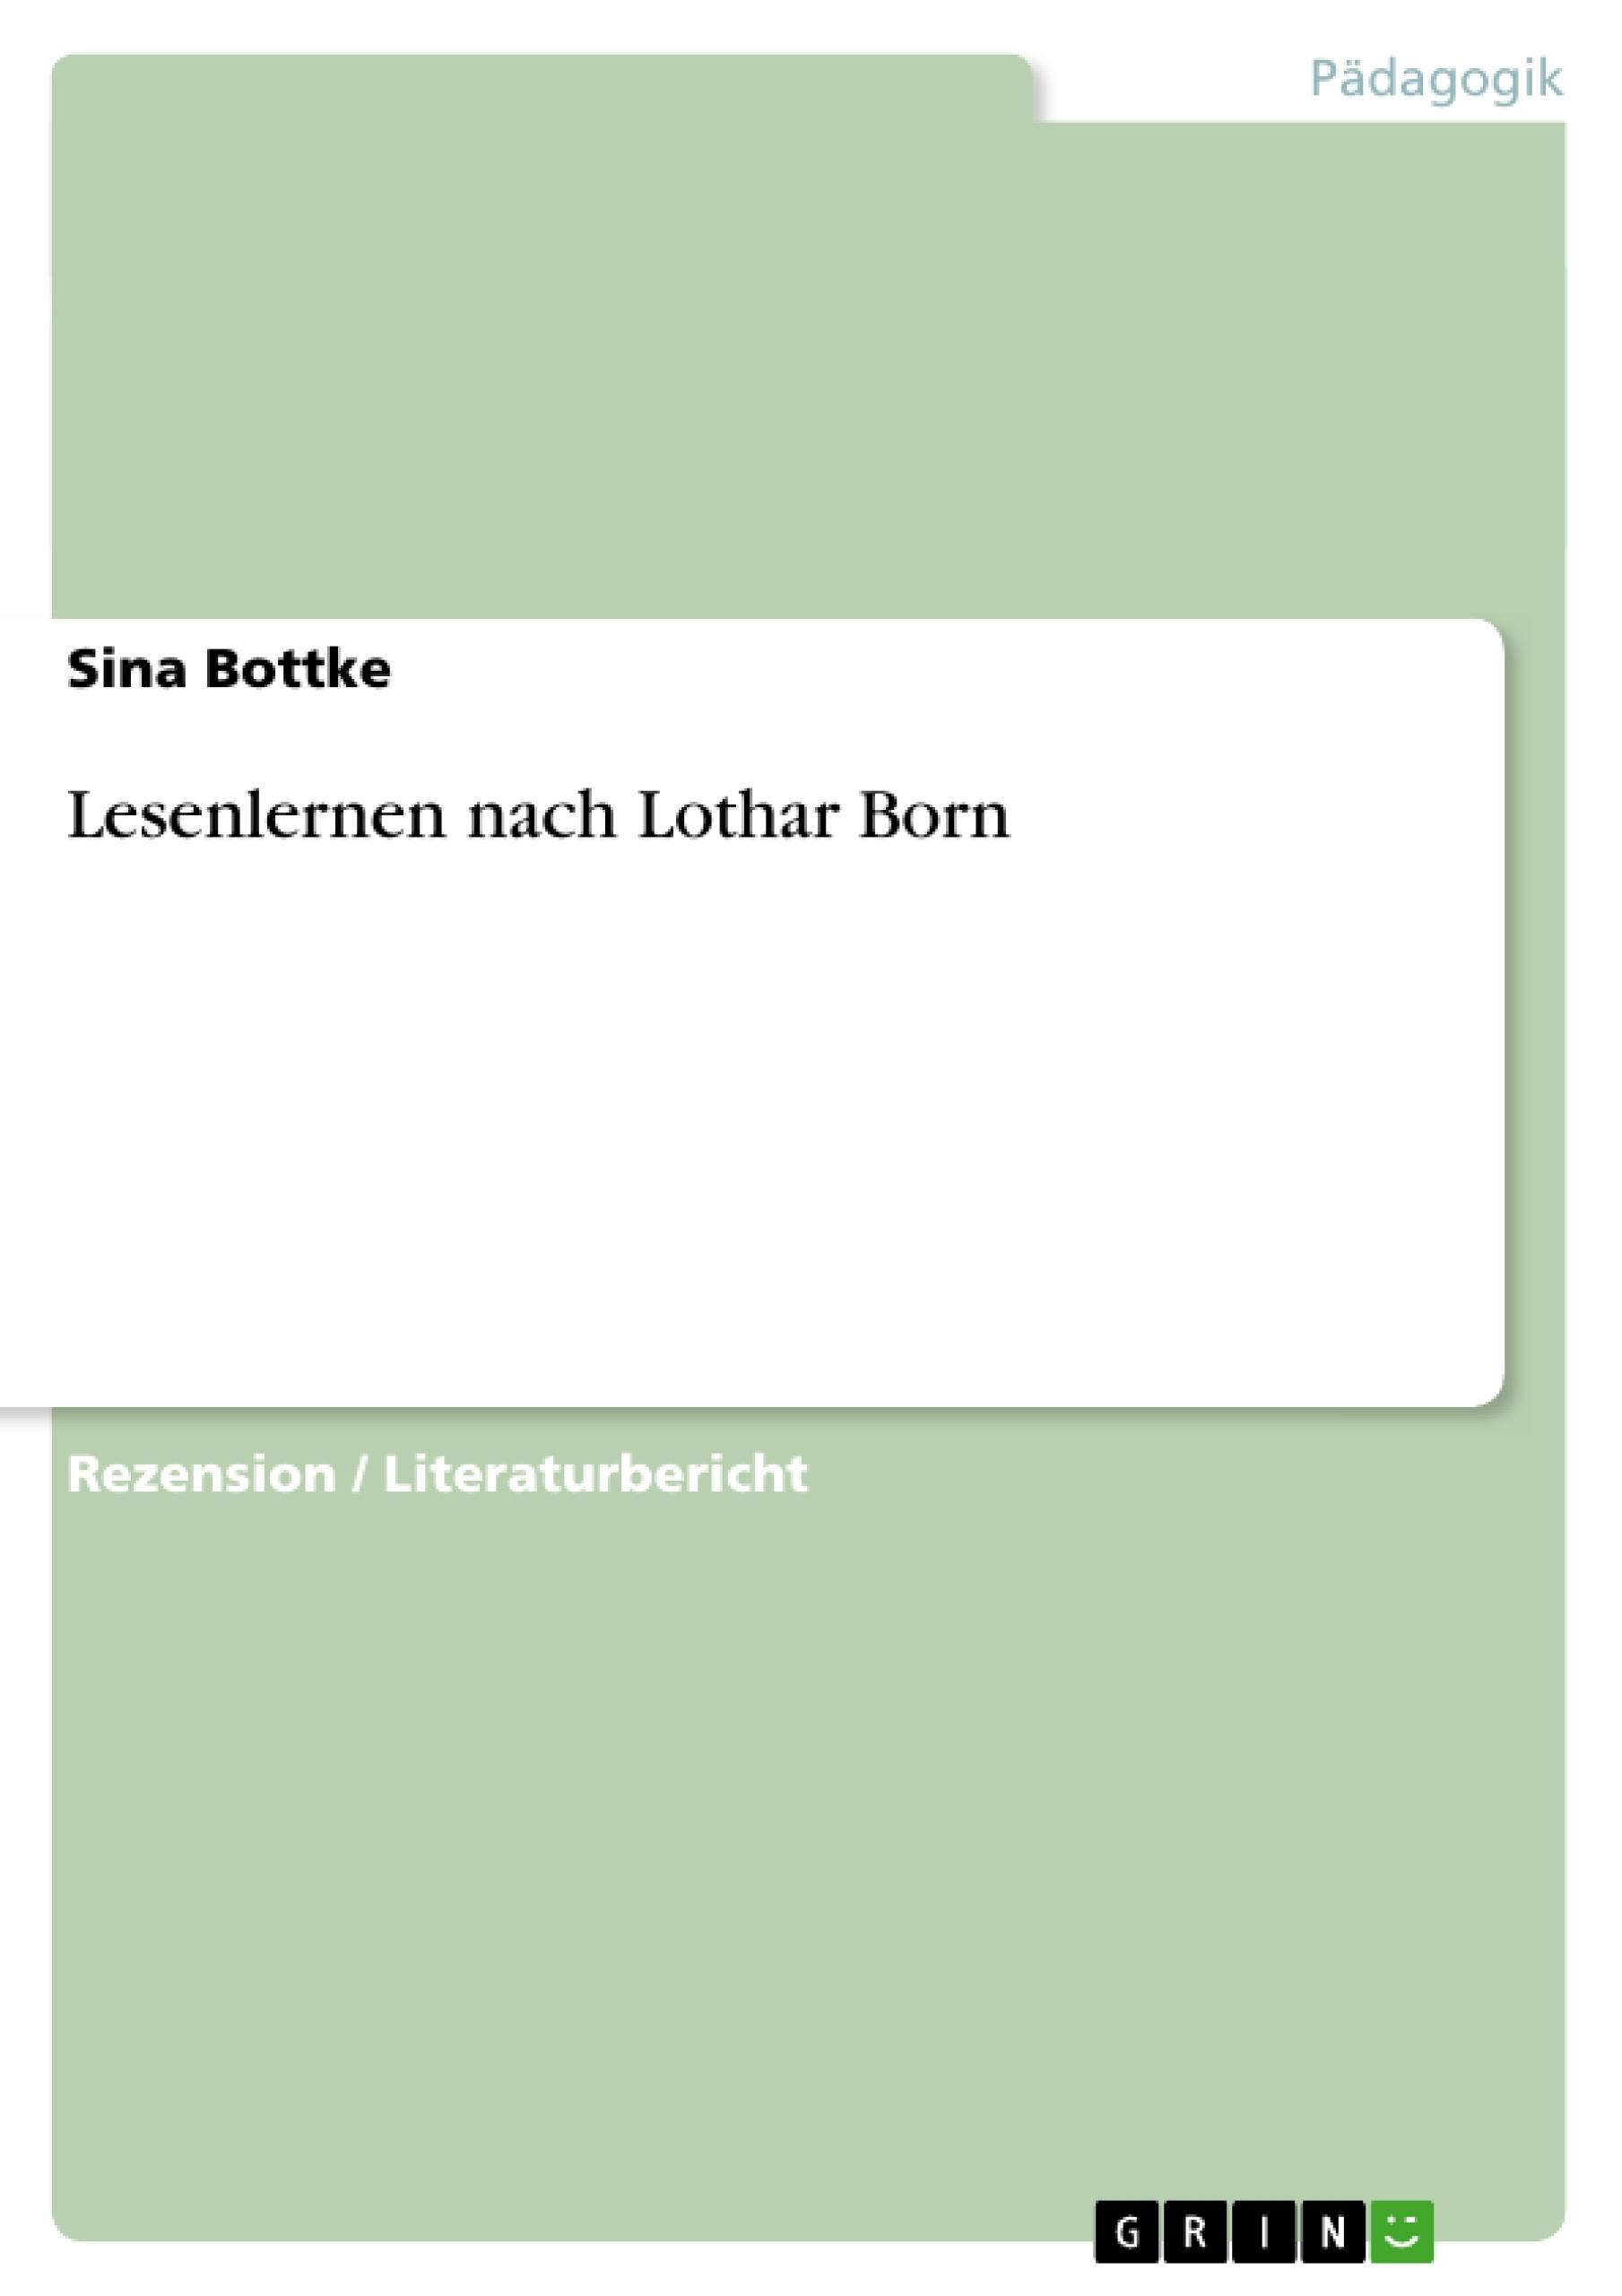 Titel: Lesenlernen nach Lothar Born